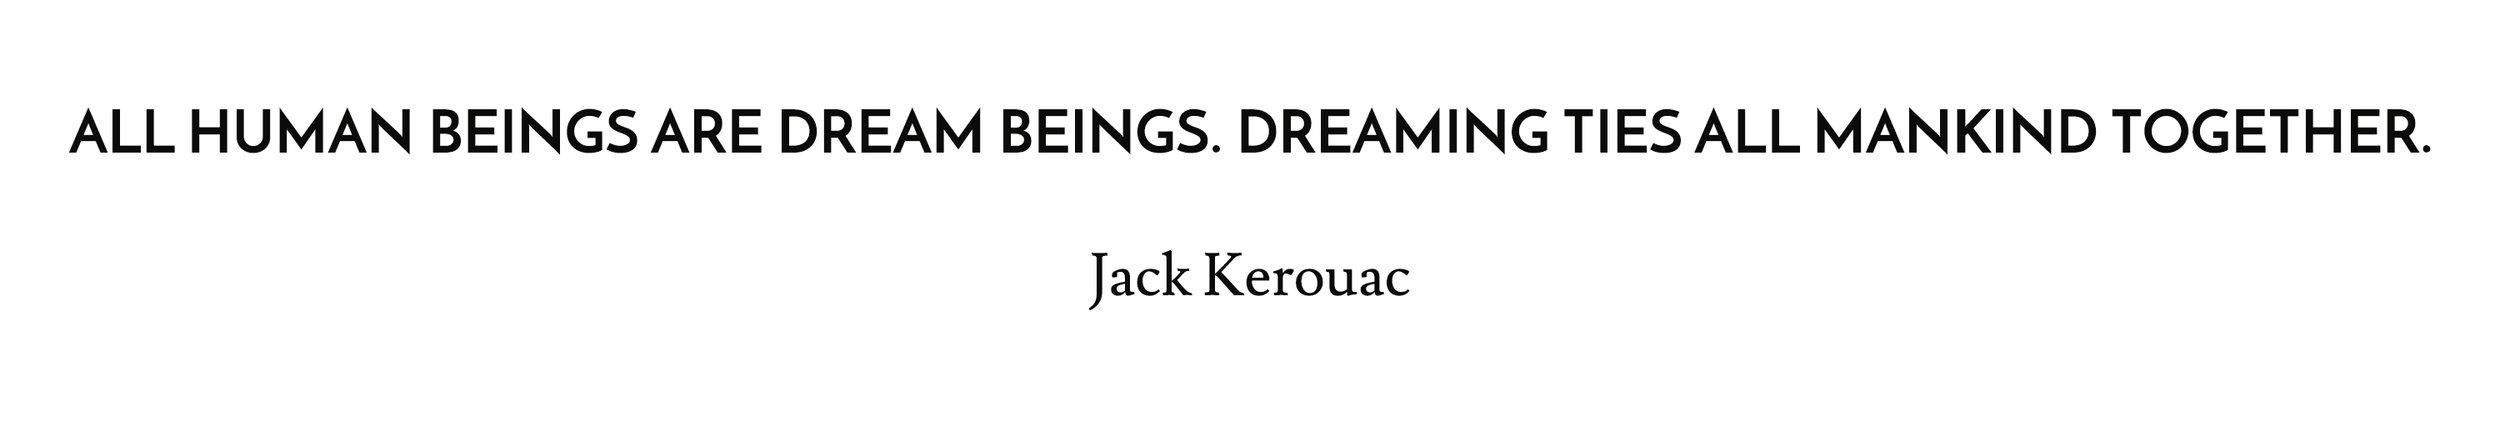 kerouac quote2.jpg